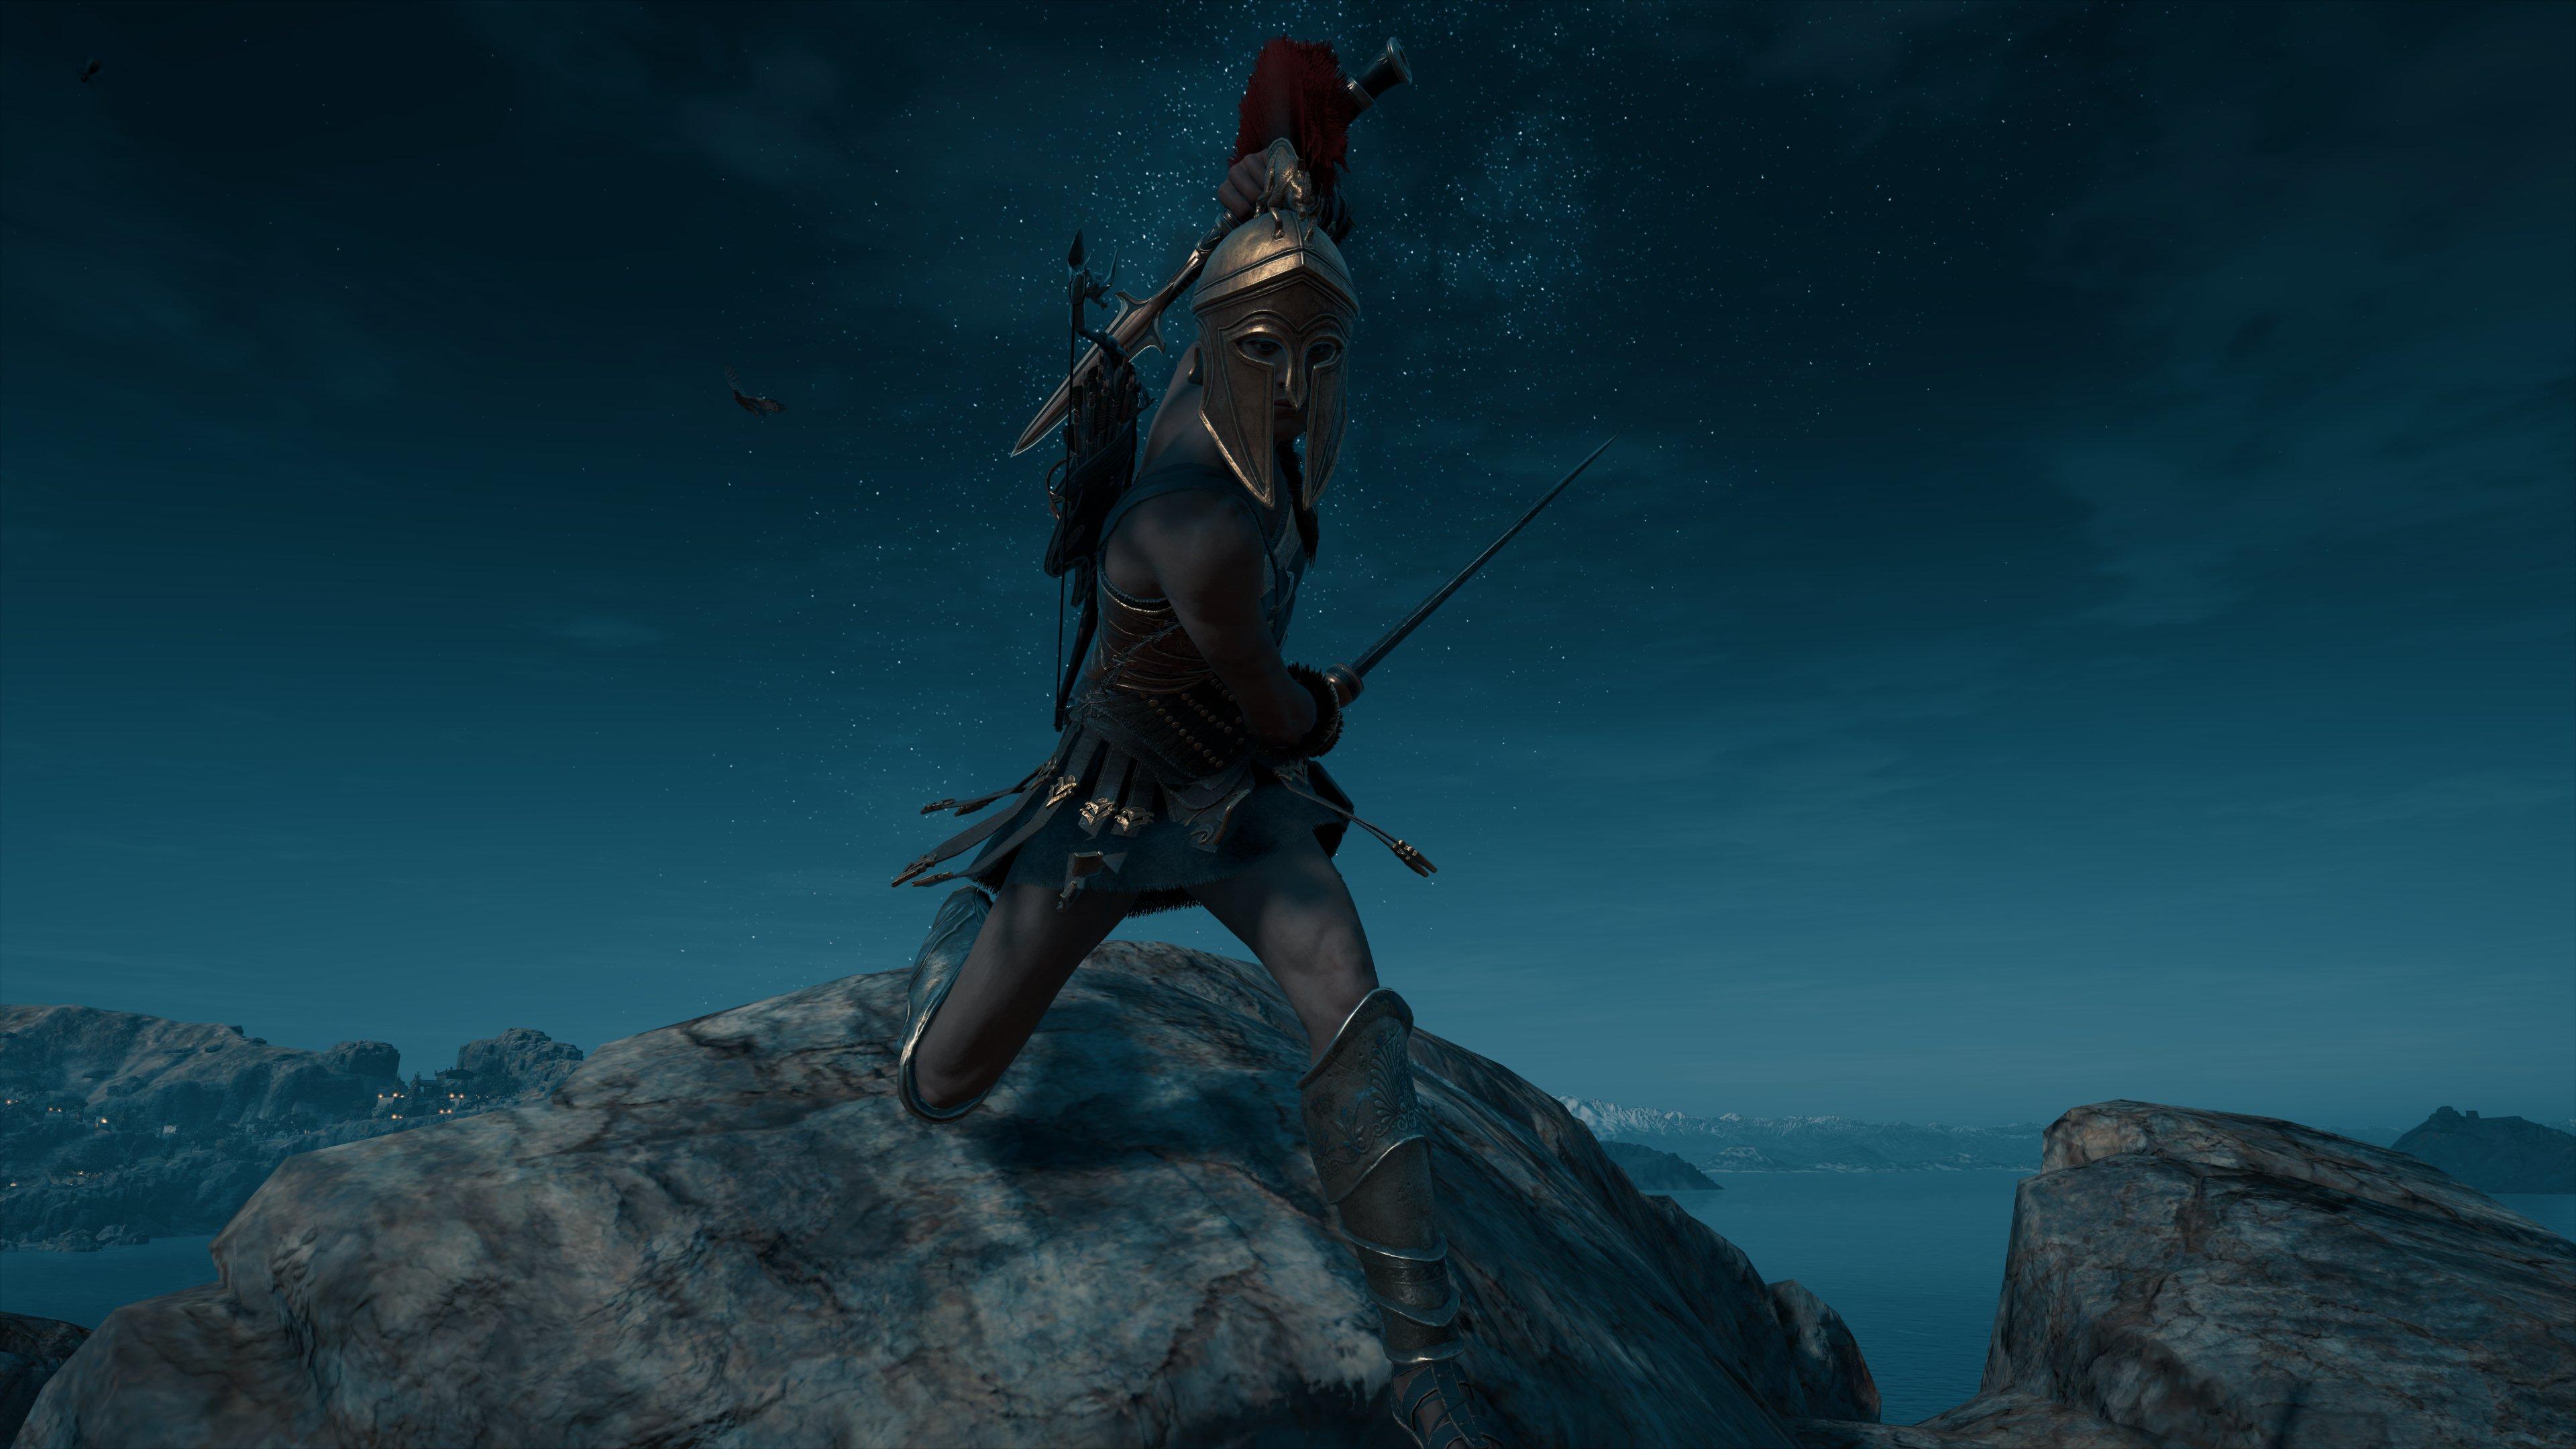 20181026183553.jpg - Assassin's Creed: Odyssey